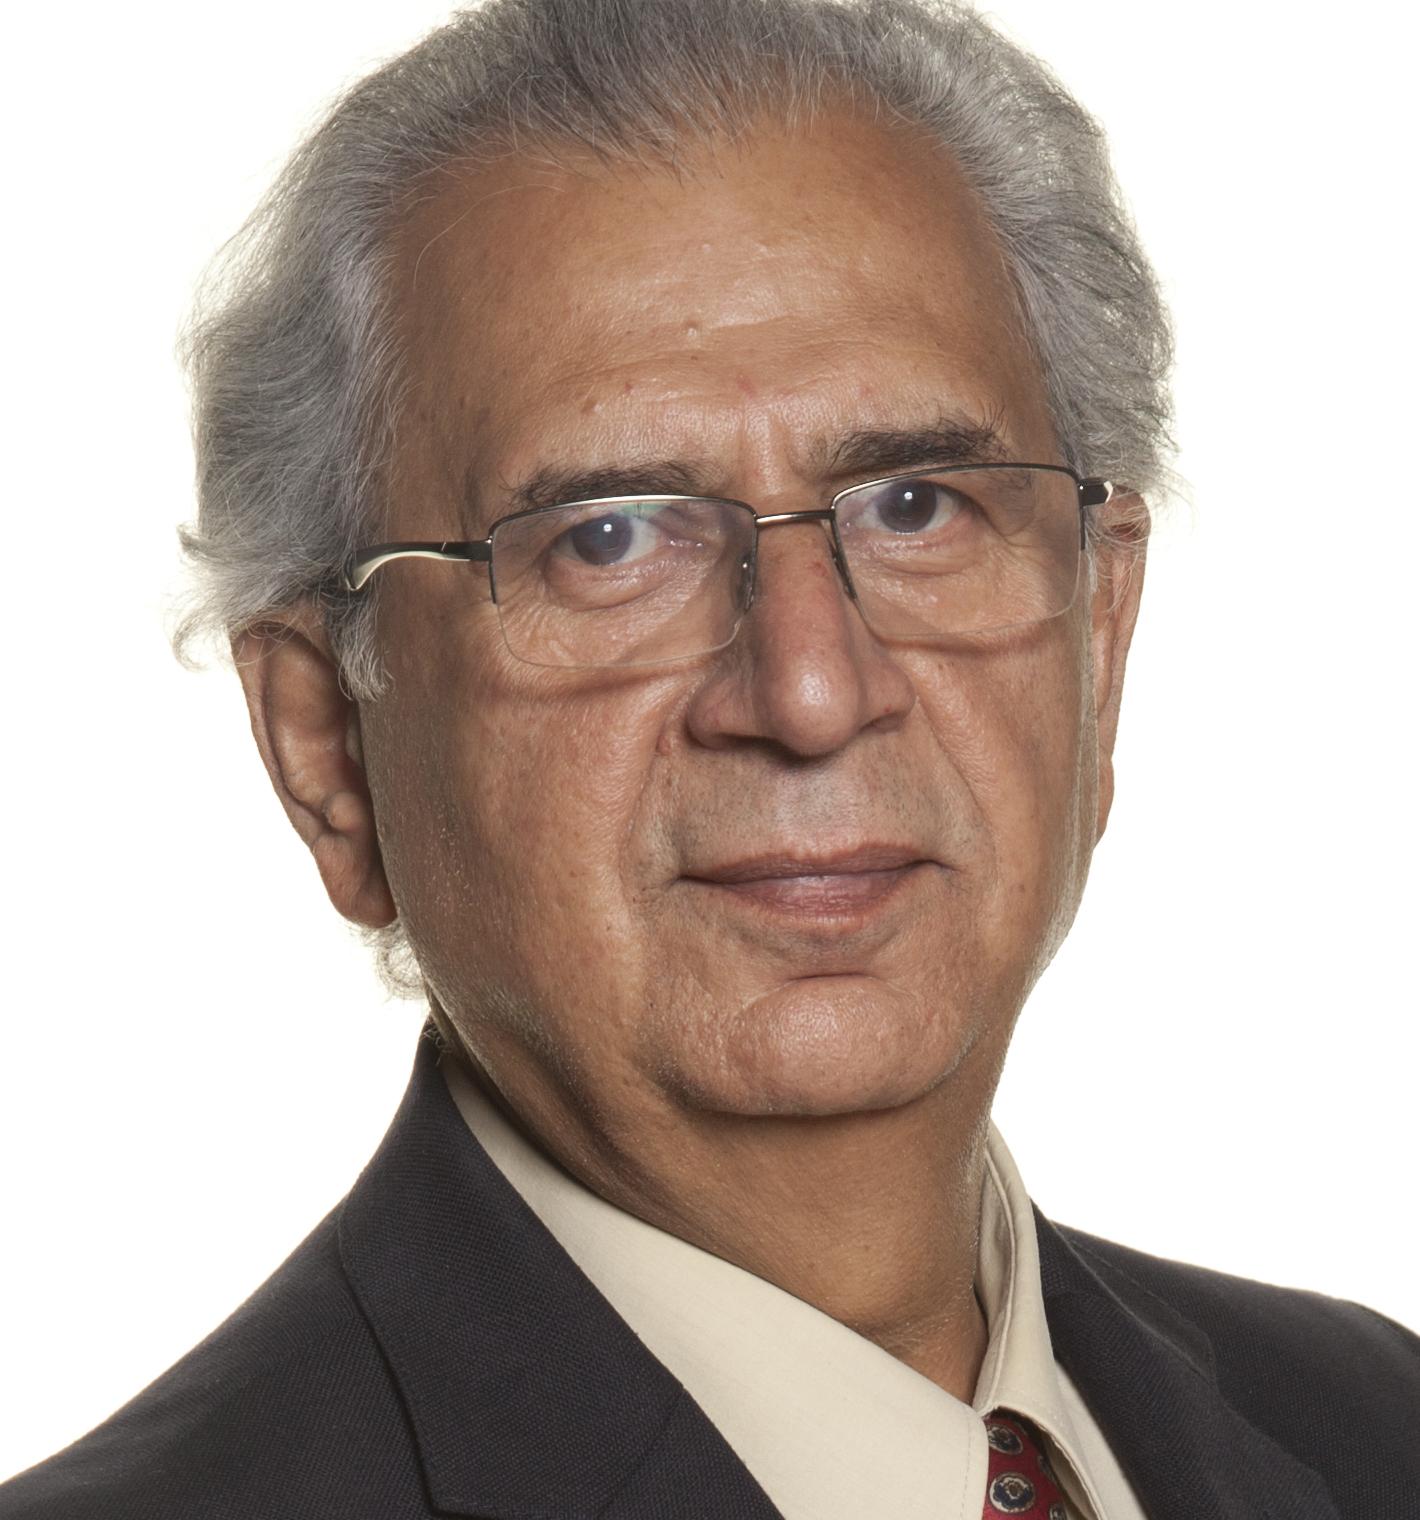 Ali-Reza Modjallal